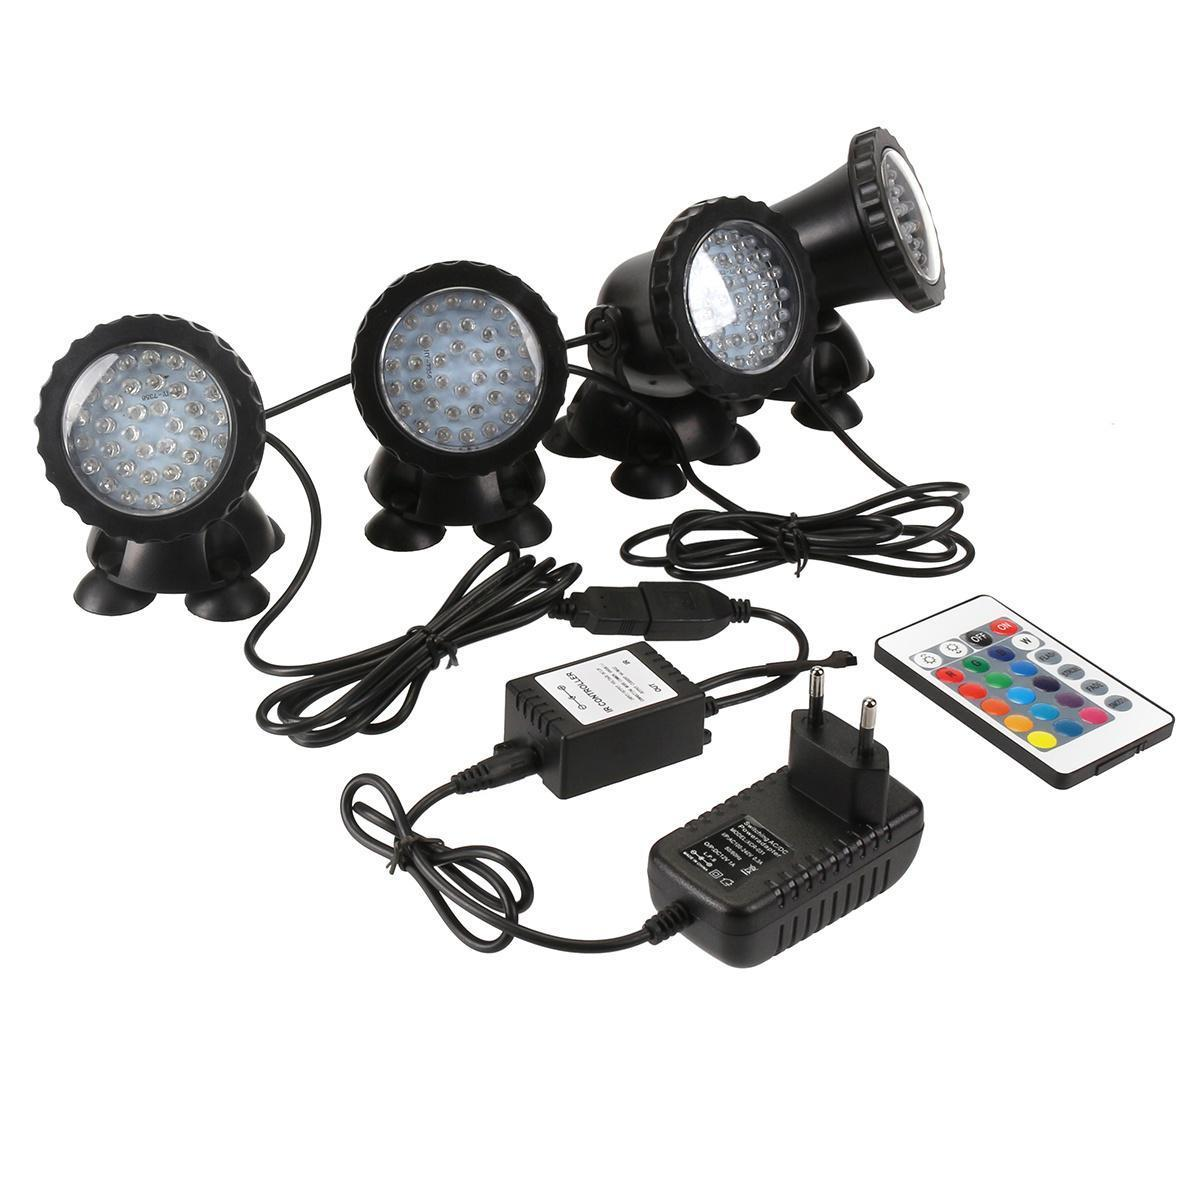 Светильники для пруда RGB 4*36 Led